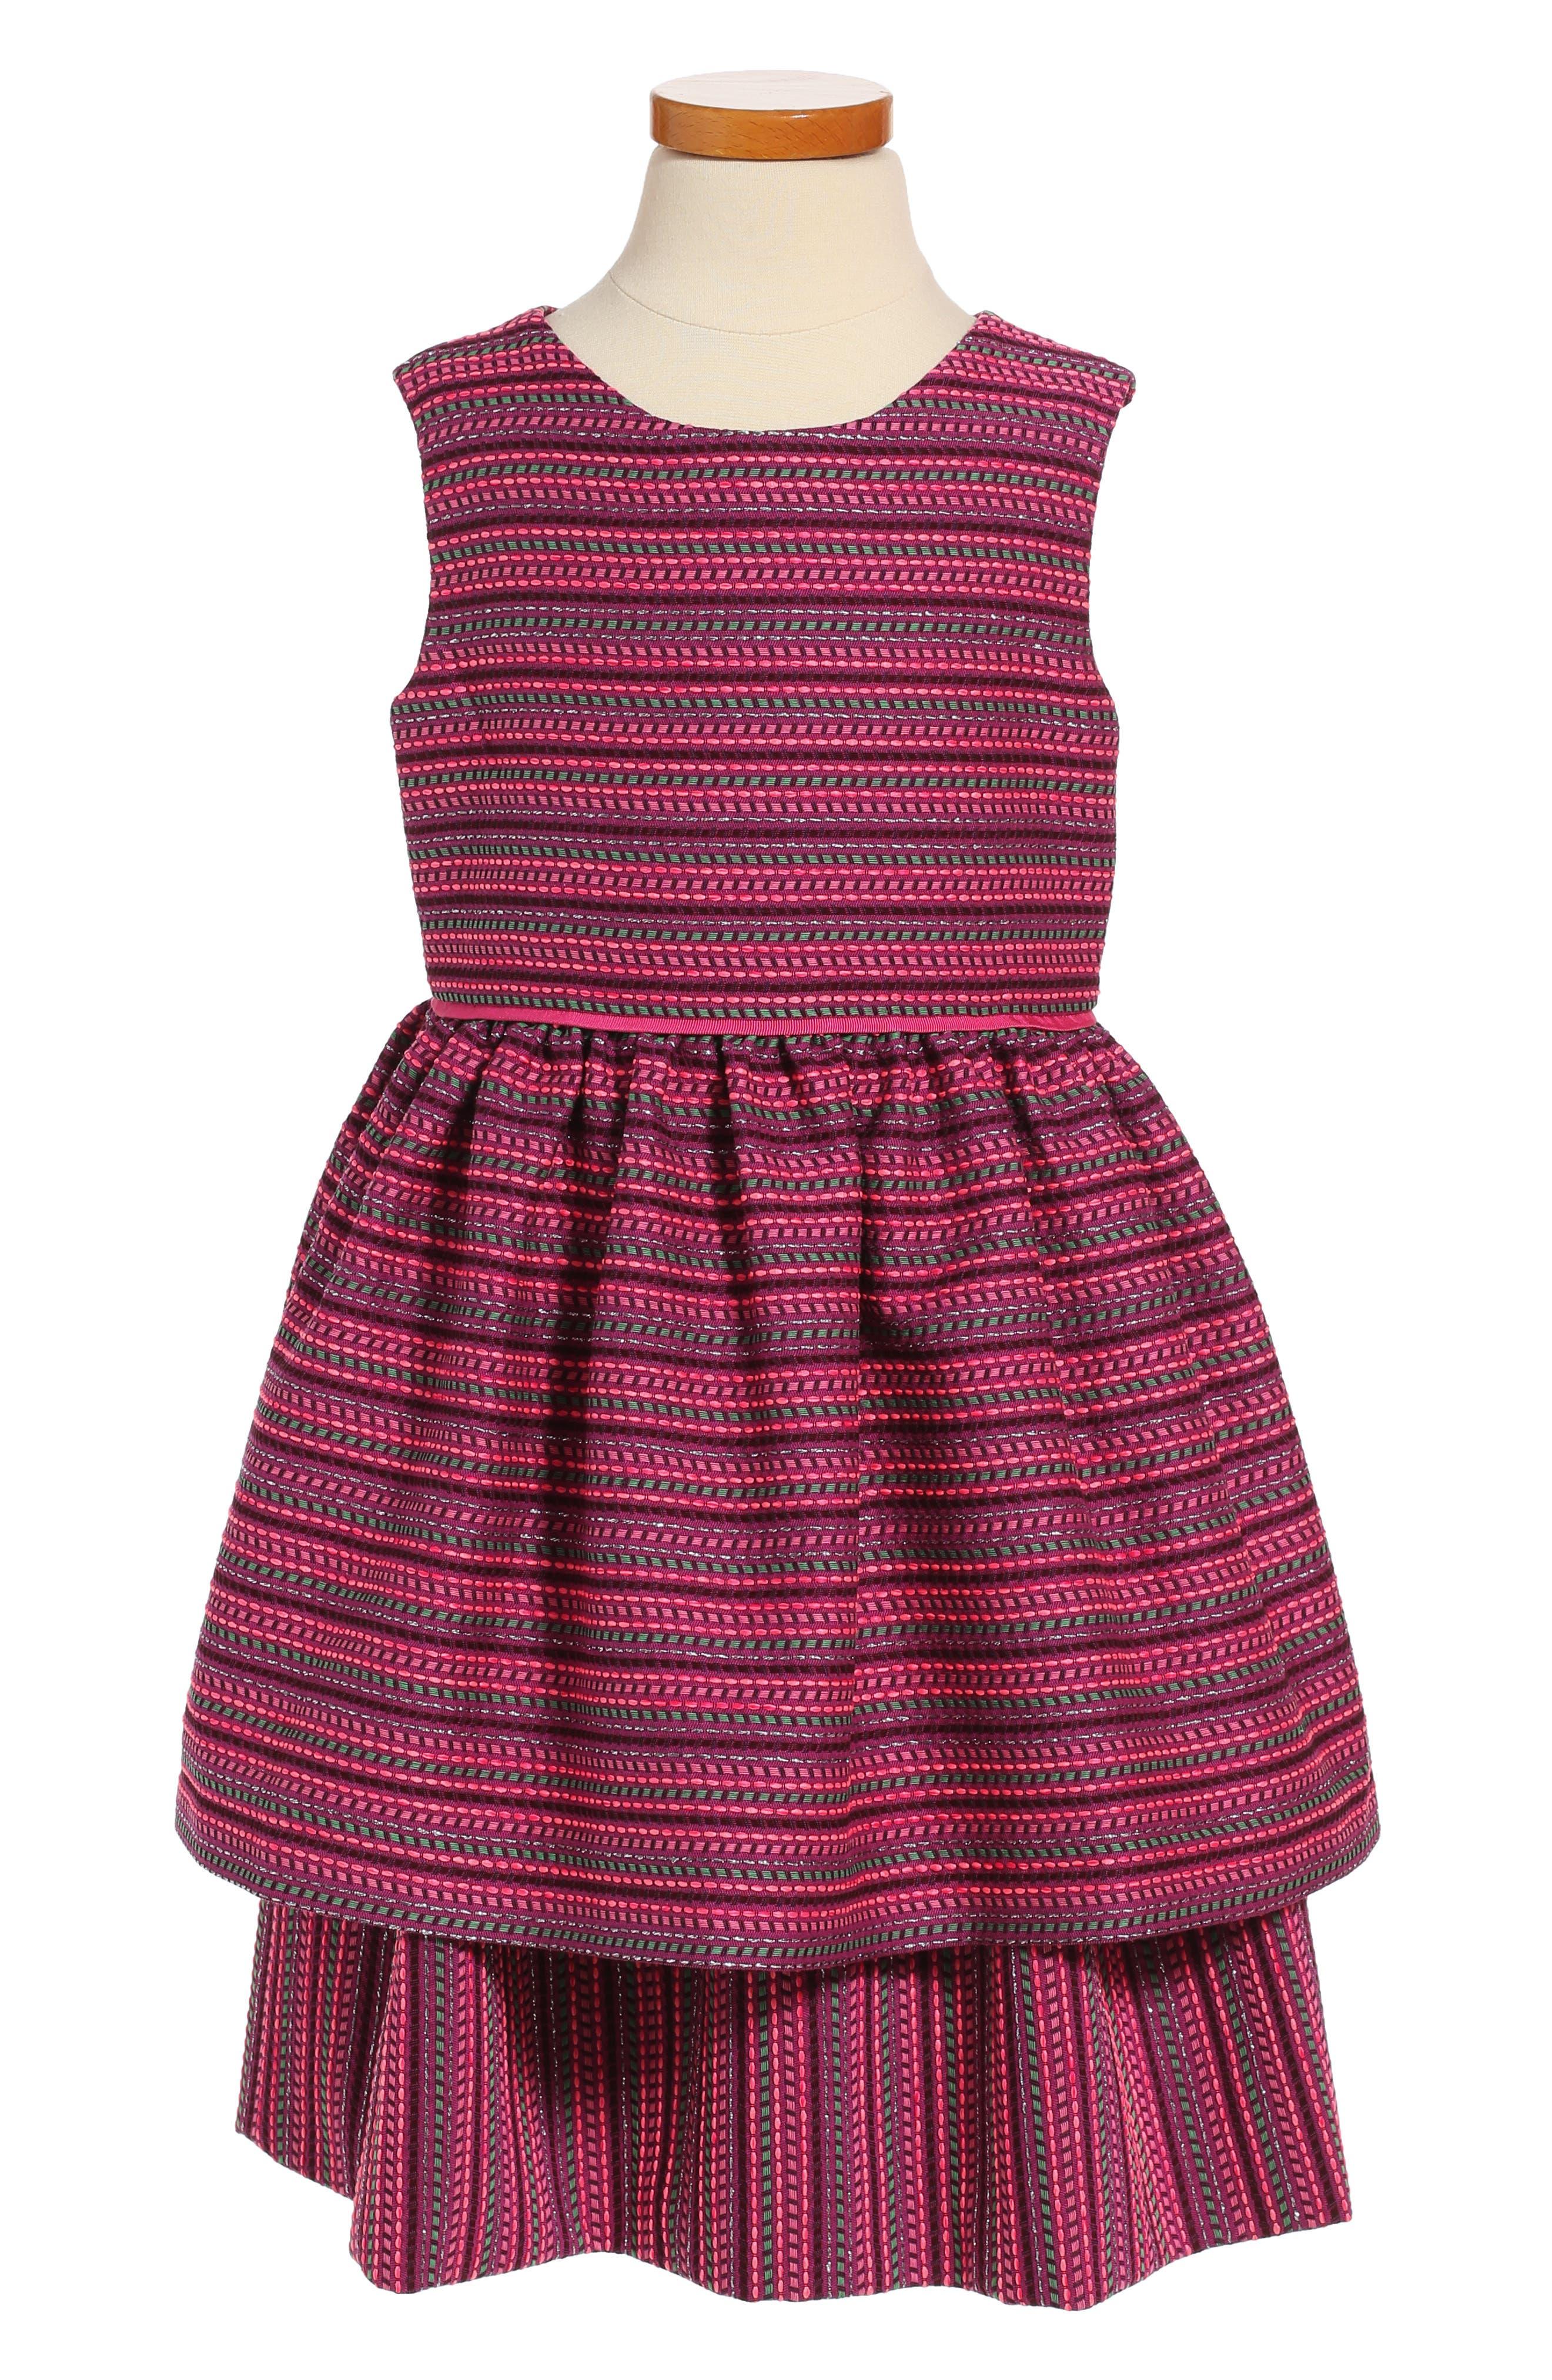 Oscar de la Renta Tiered Sleeveless Dress (Big Girls)